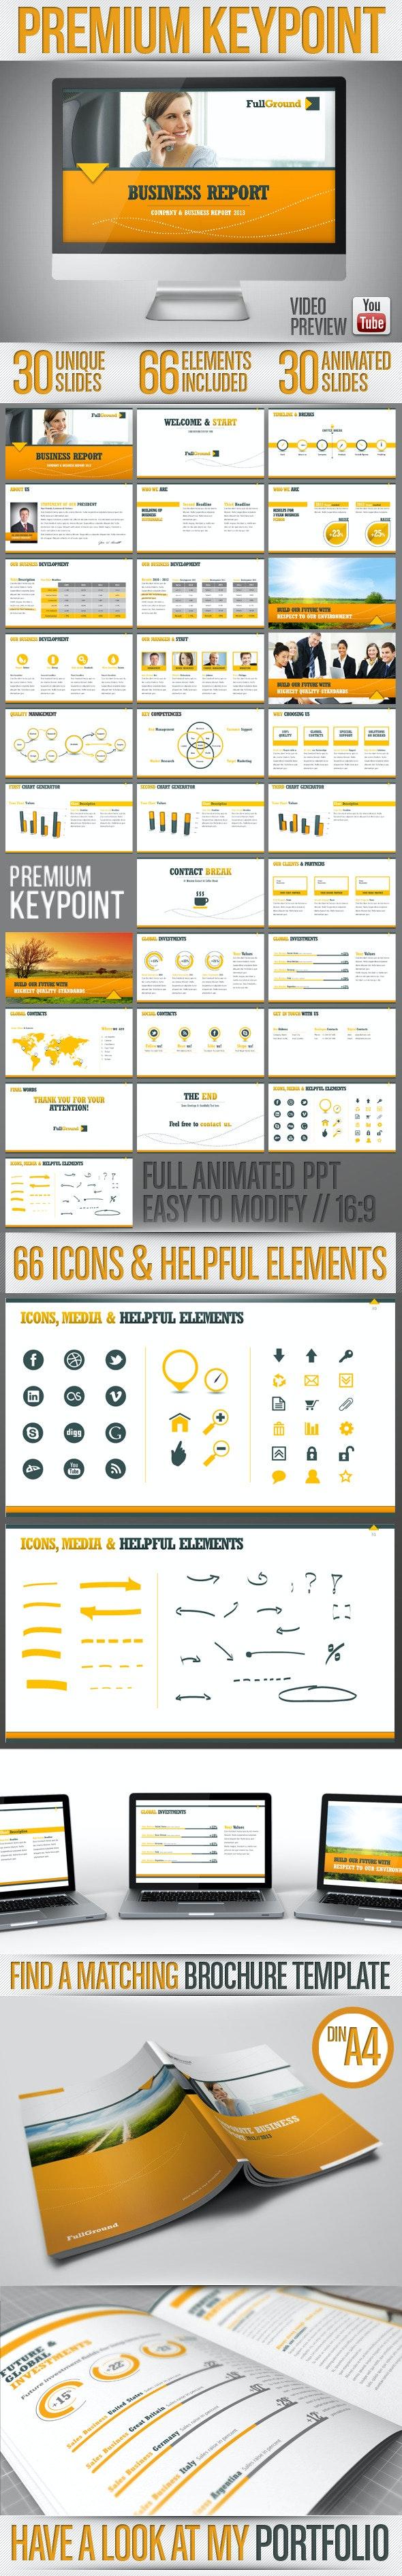 Fullground - Keynote Presentation Template  - Business Keynote Templates